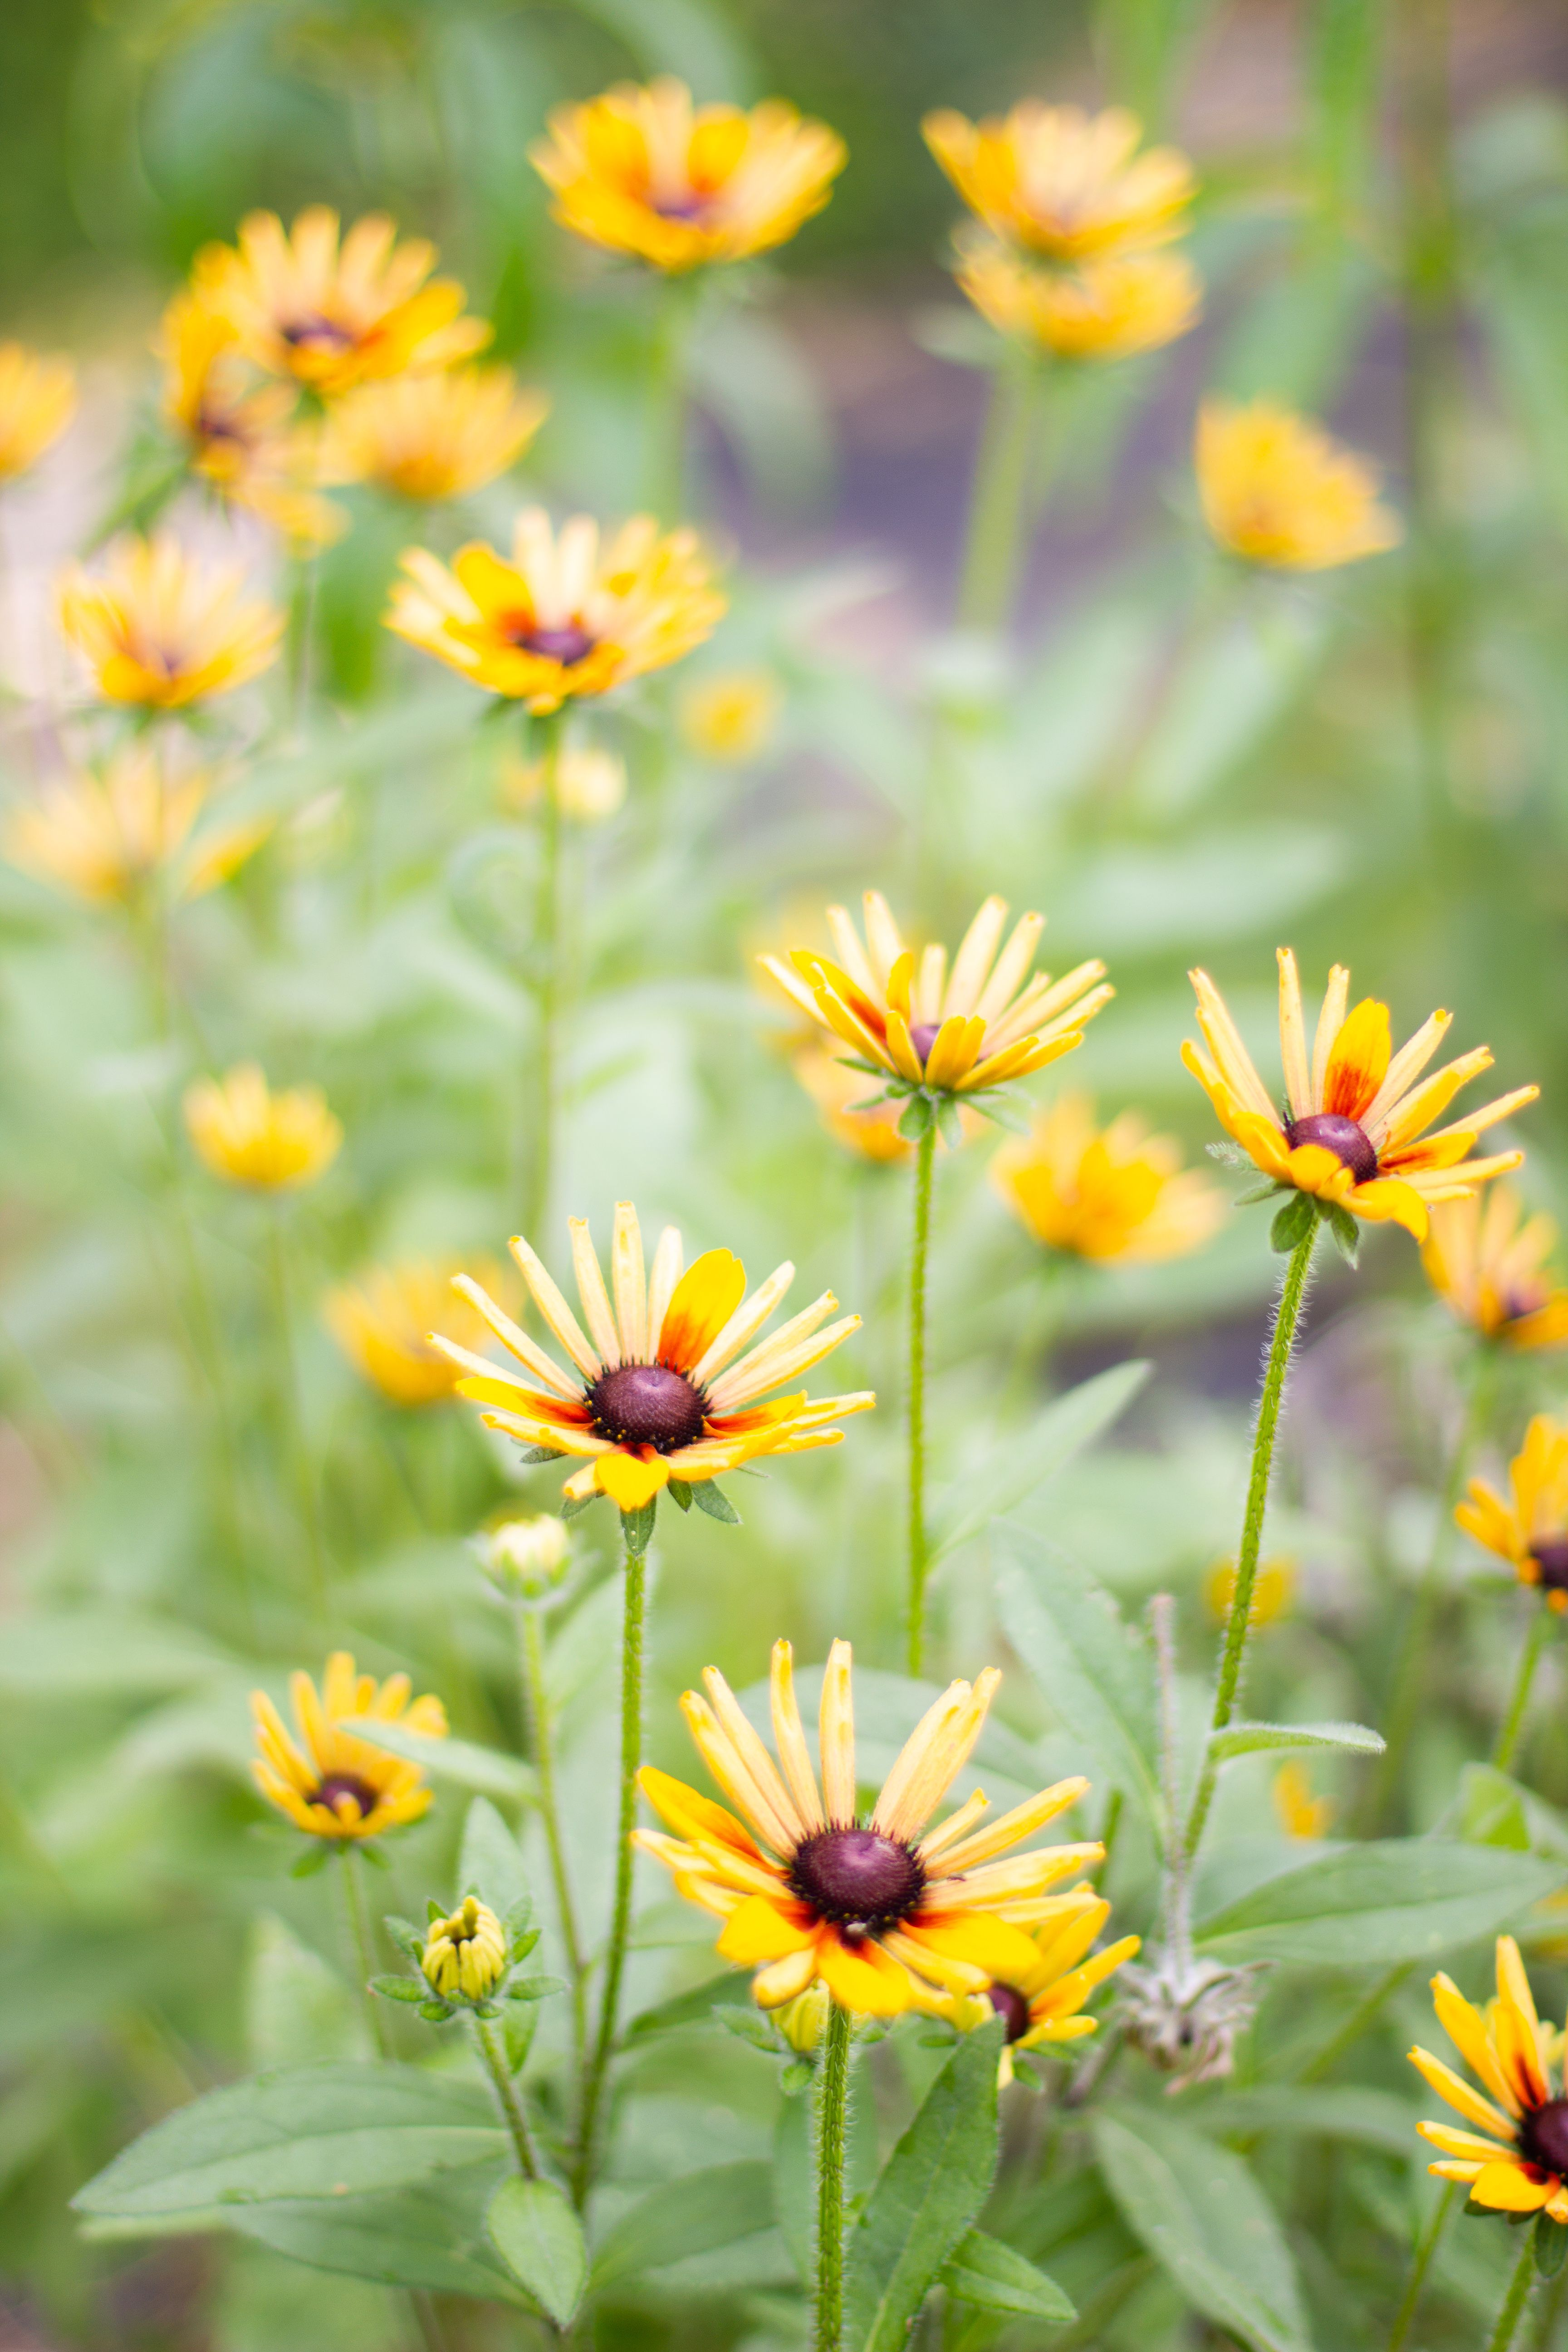 Rudbeckia 'Chim Chiminee' in 2020 Flower farm, Shade